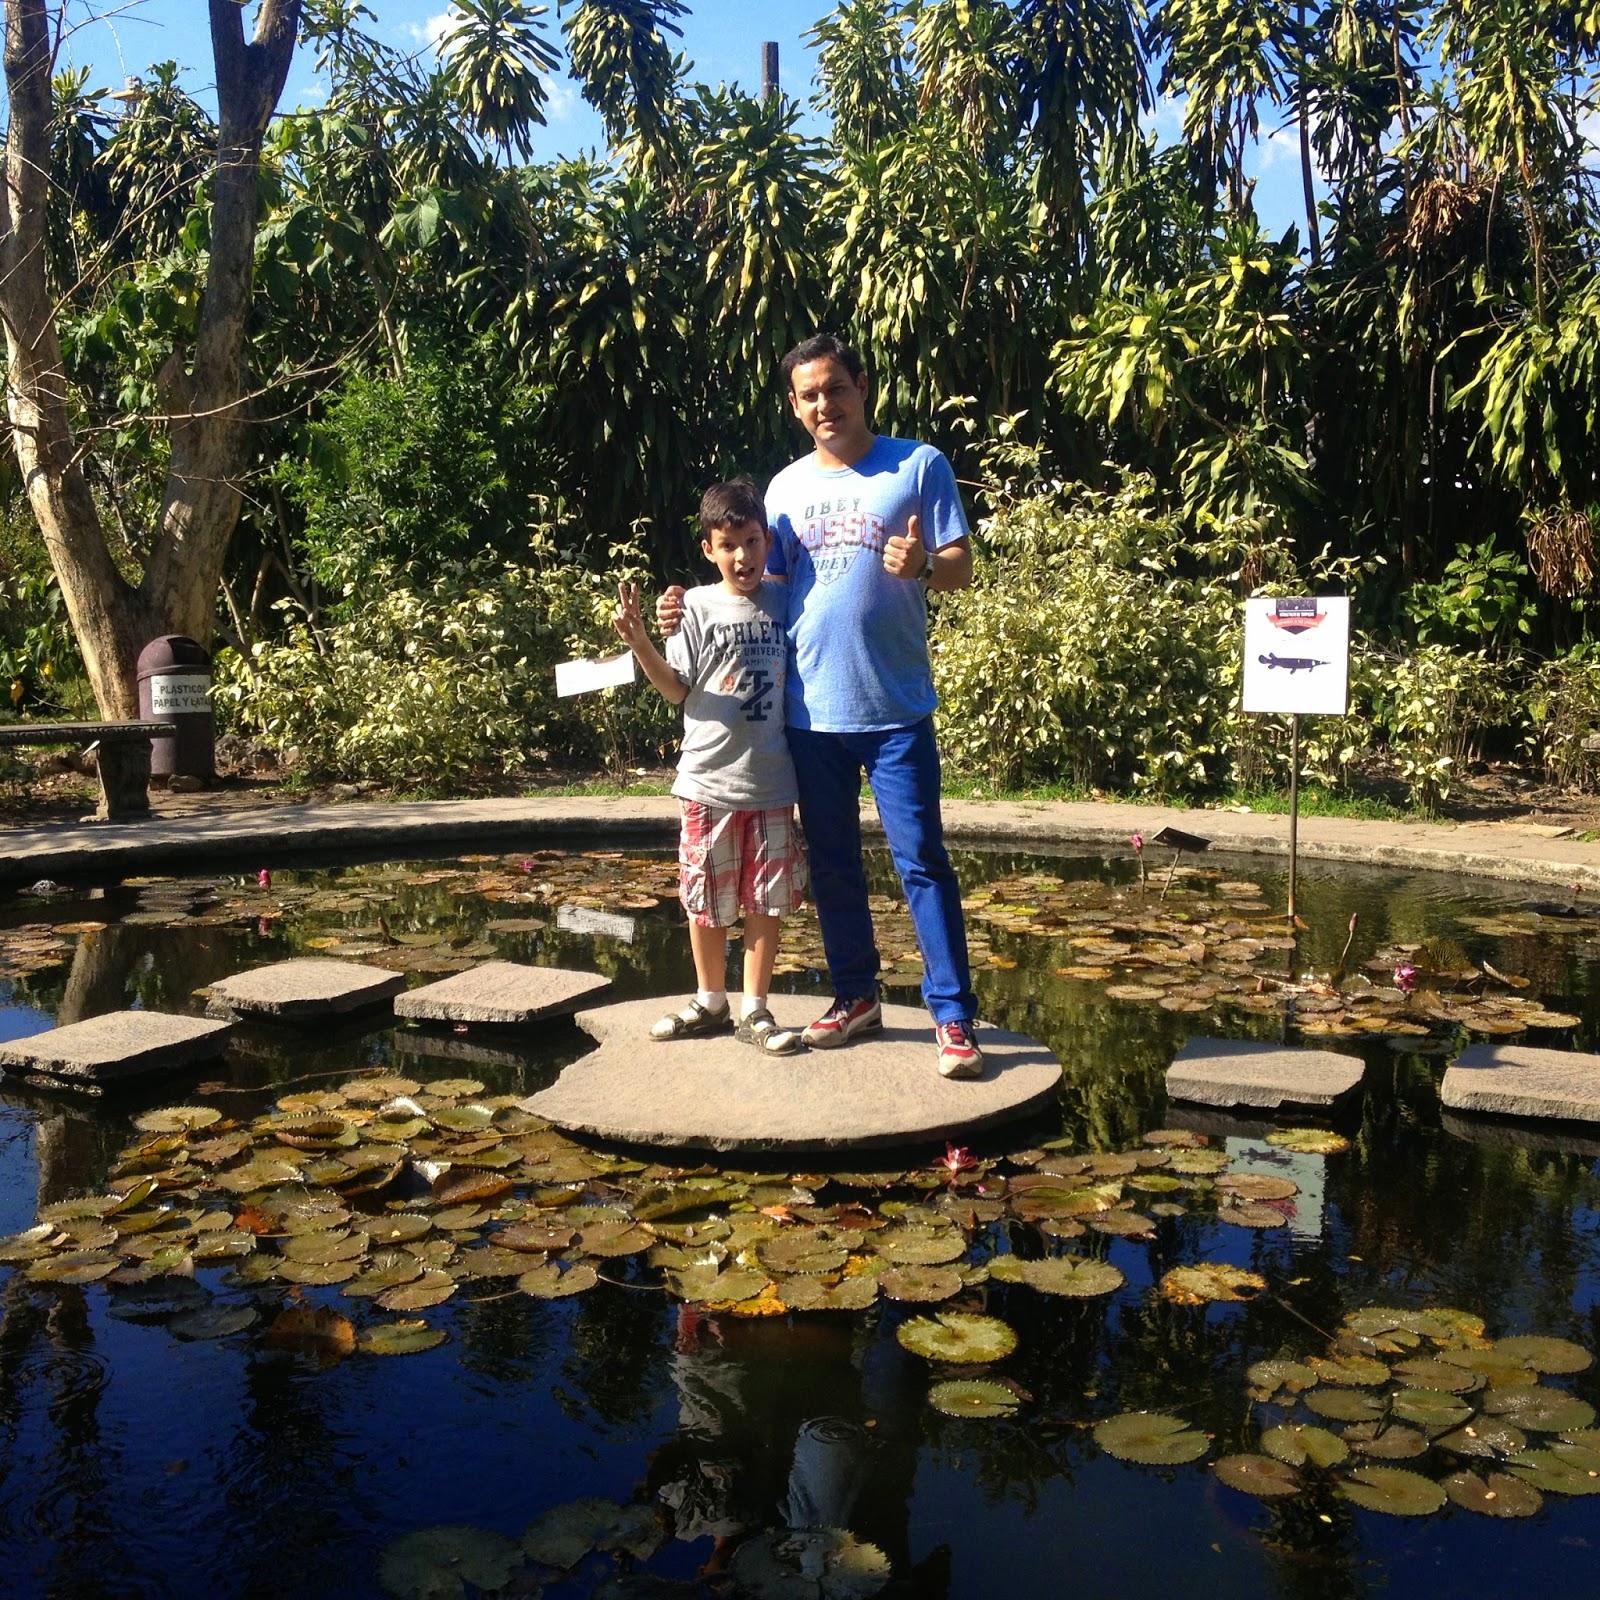 Imagenes jard n bot nico la laguna antiguo cuscatl n - Cosas para el jardin ...